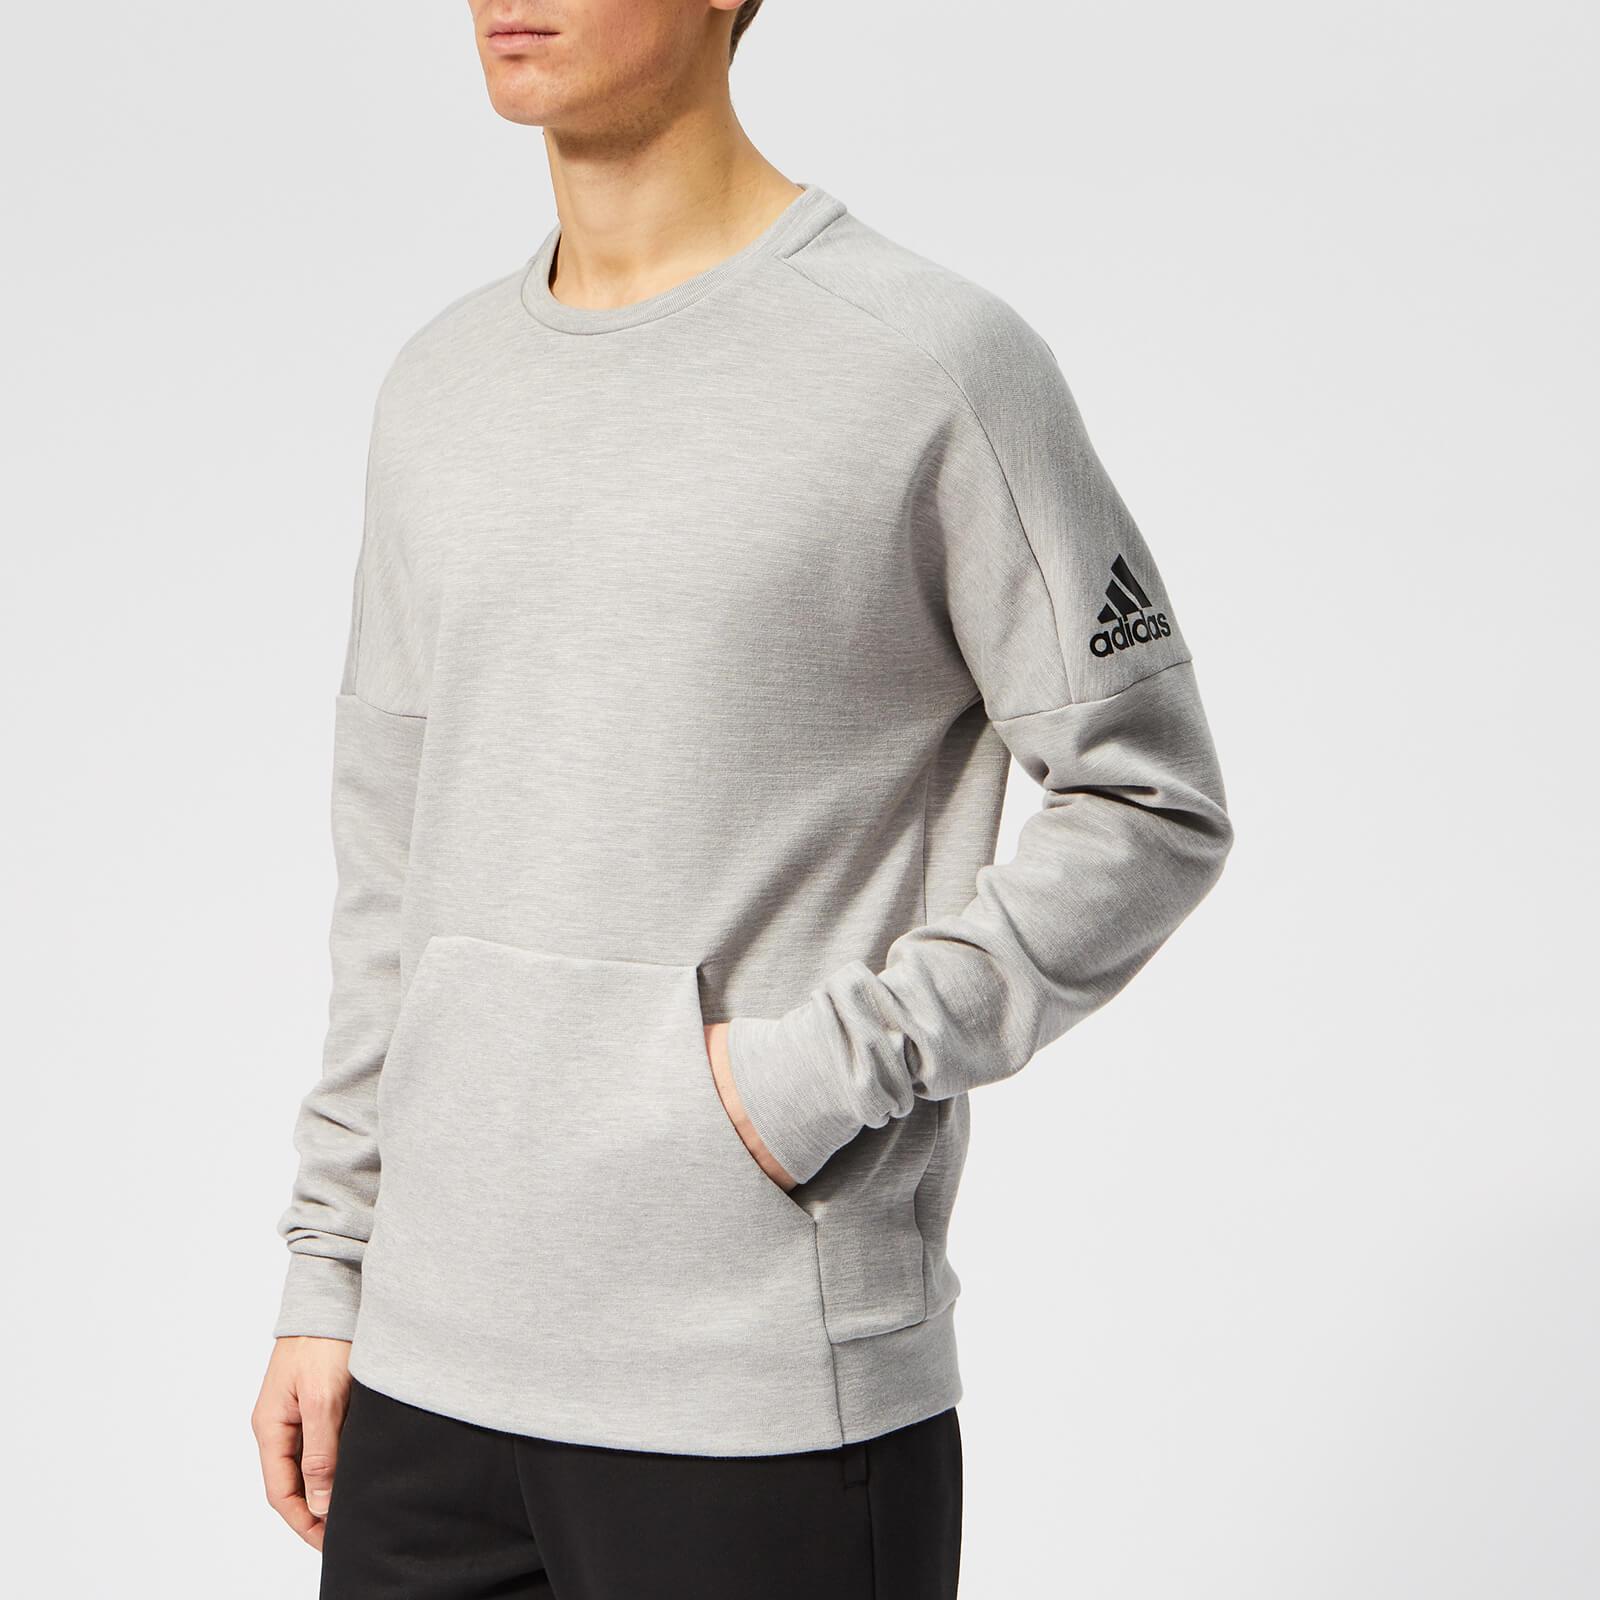 adidas Men's ID Stadium Crew Neck Sweatshirt - Grey Heather - L - Grey